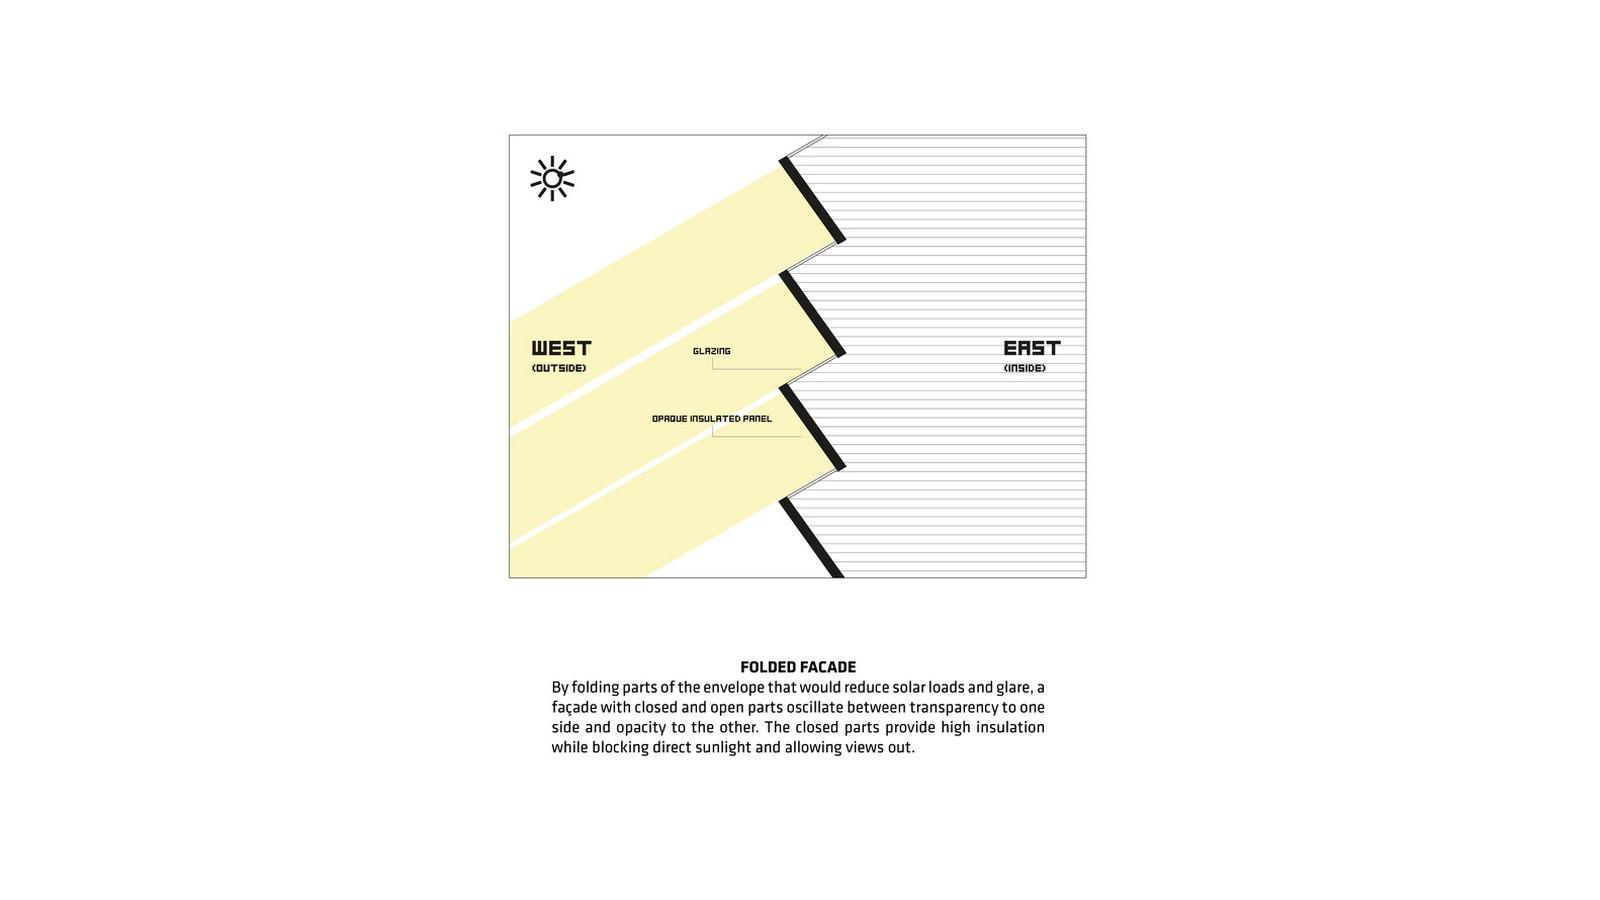 Shenzhen International Energy Mansion by BIG: The uncommon facade design - Sheet5